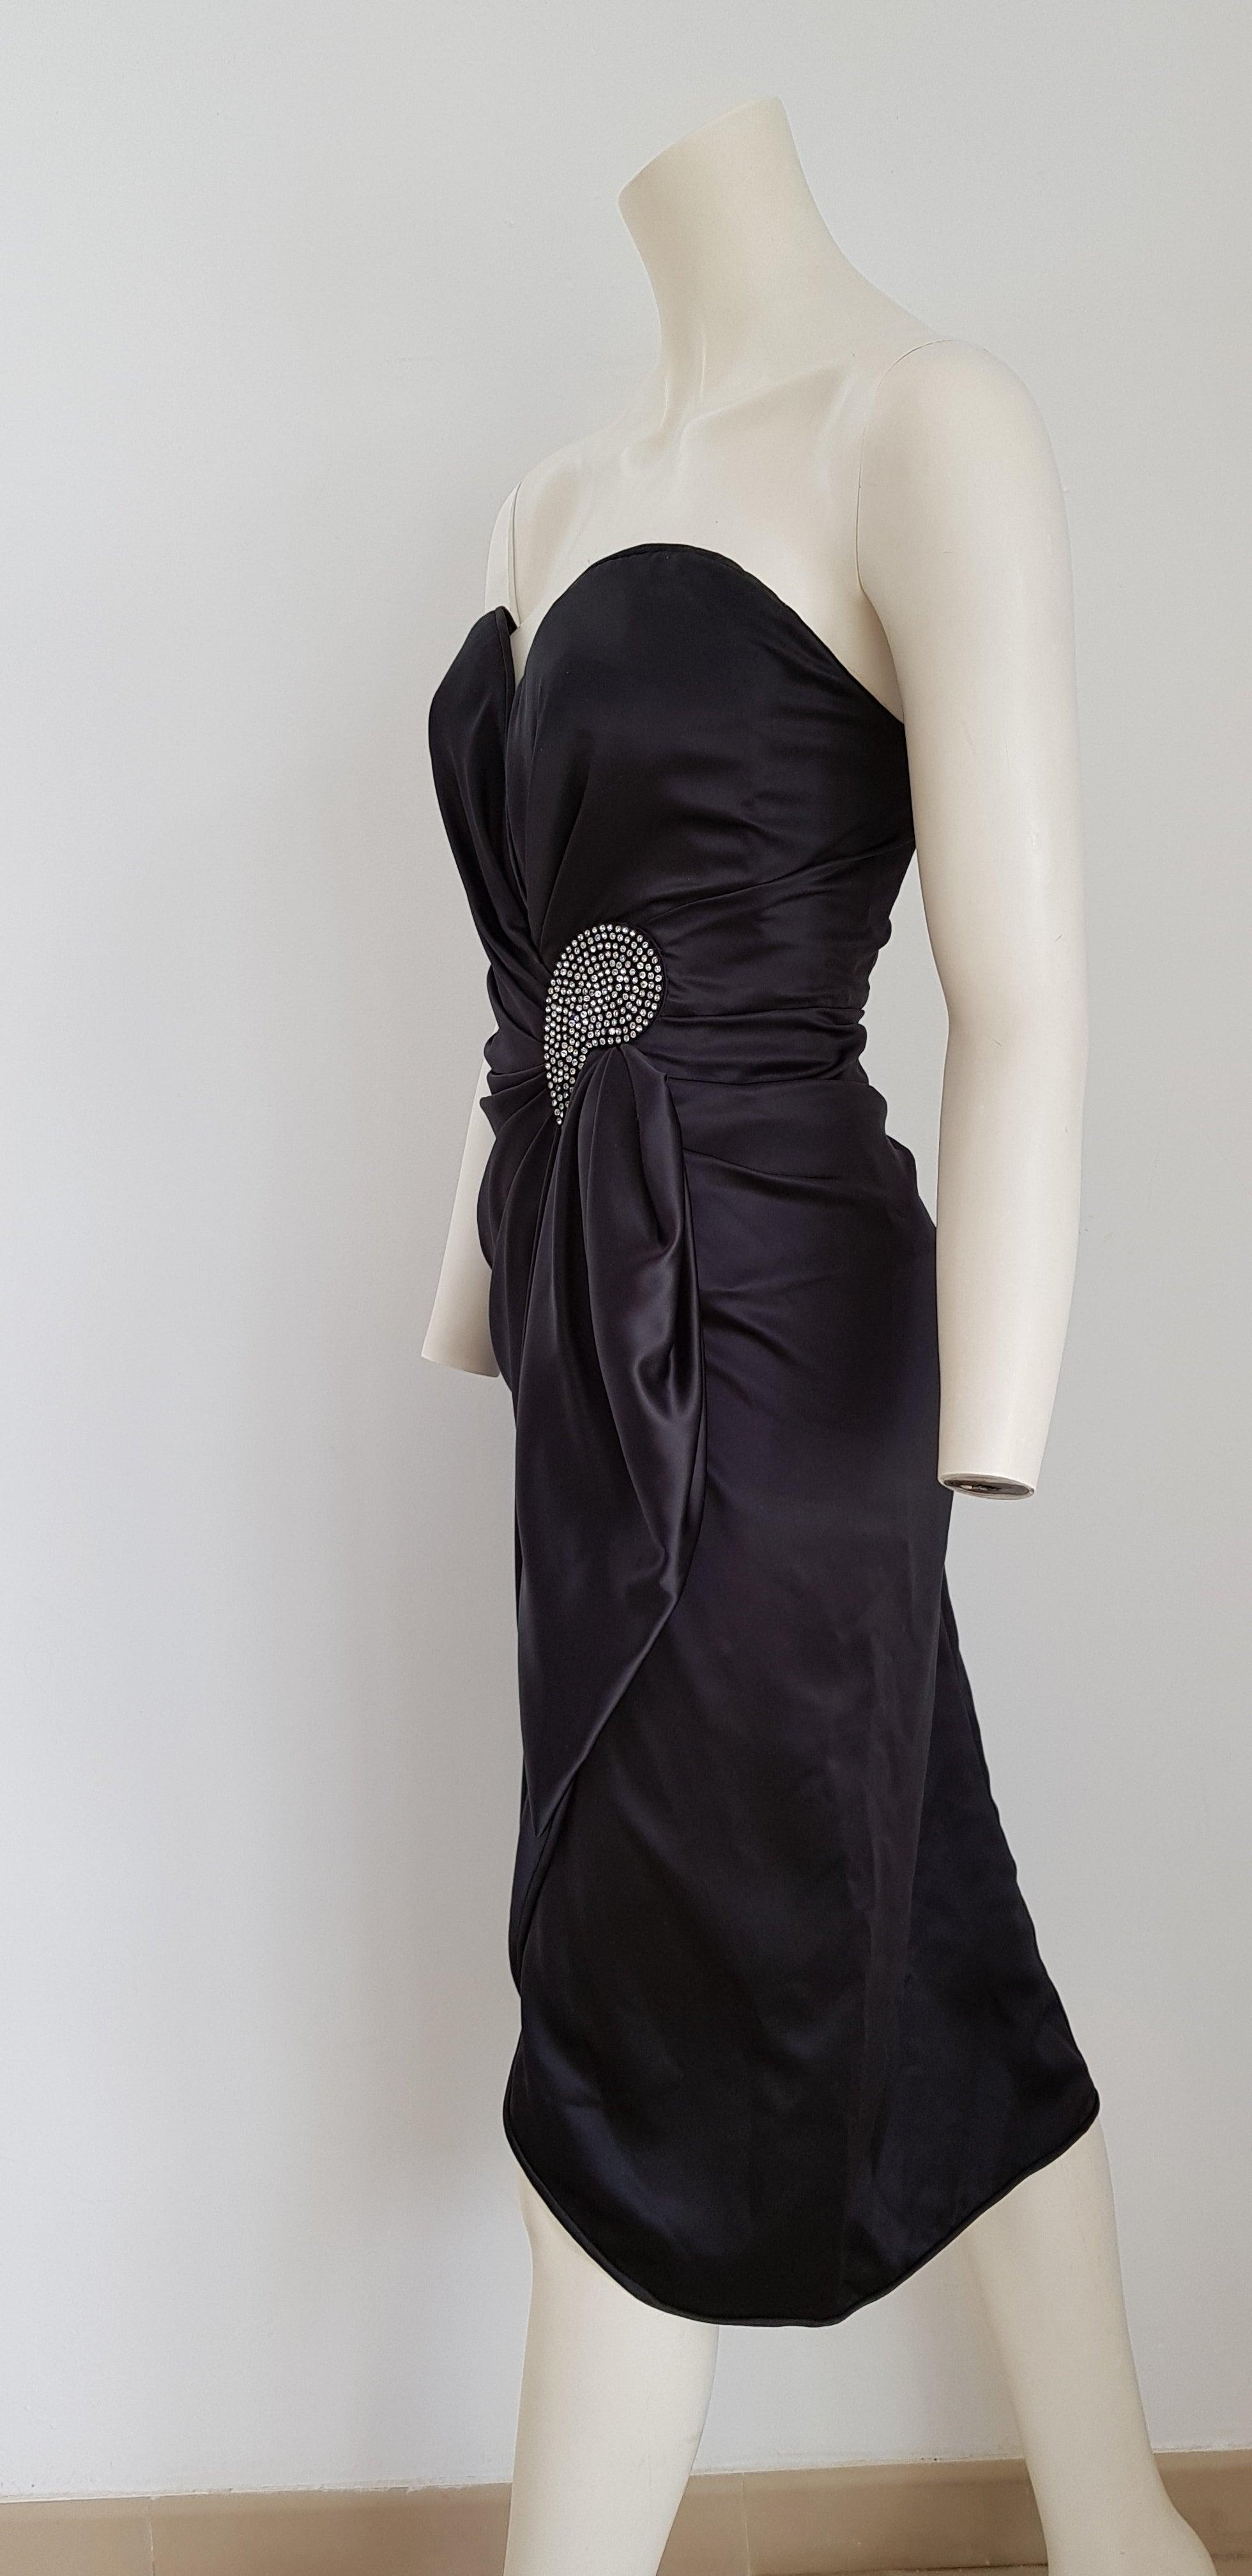 907ac342d1265 VALENTINO Haute Couture Swarovski Diamanten fallen vor